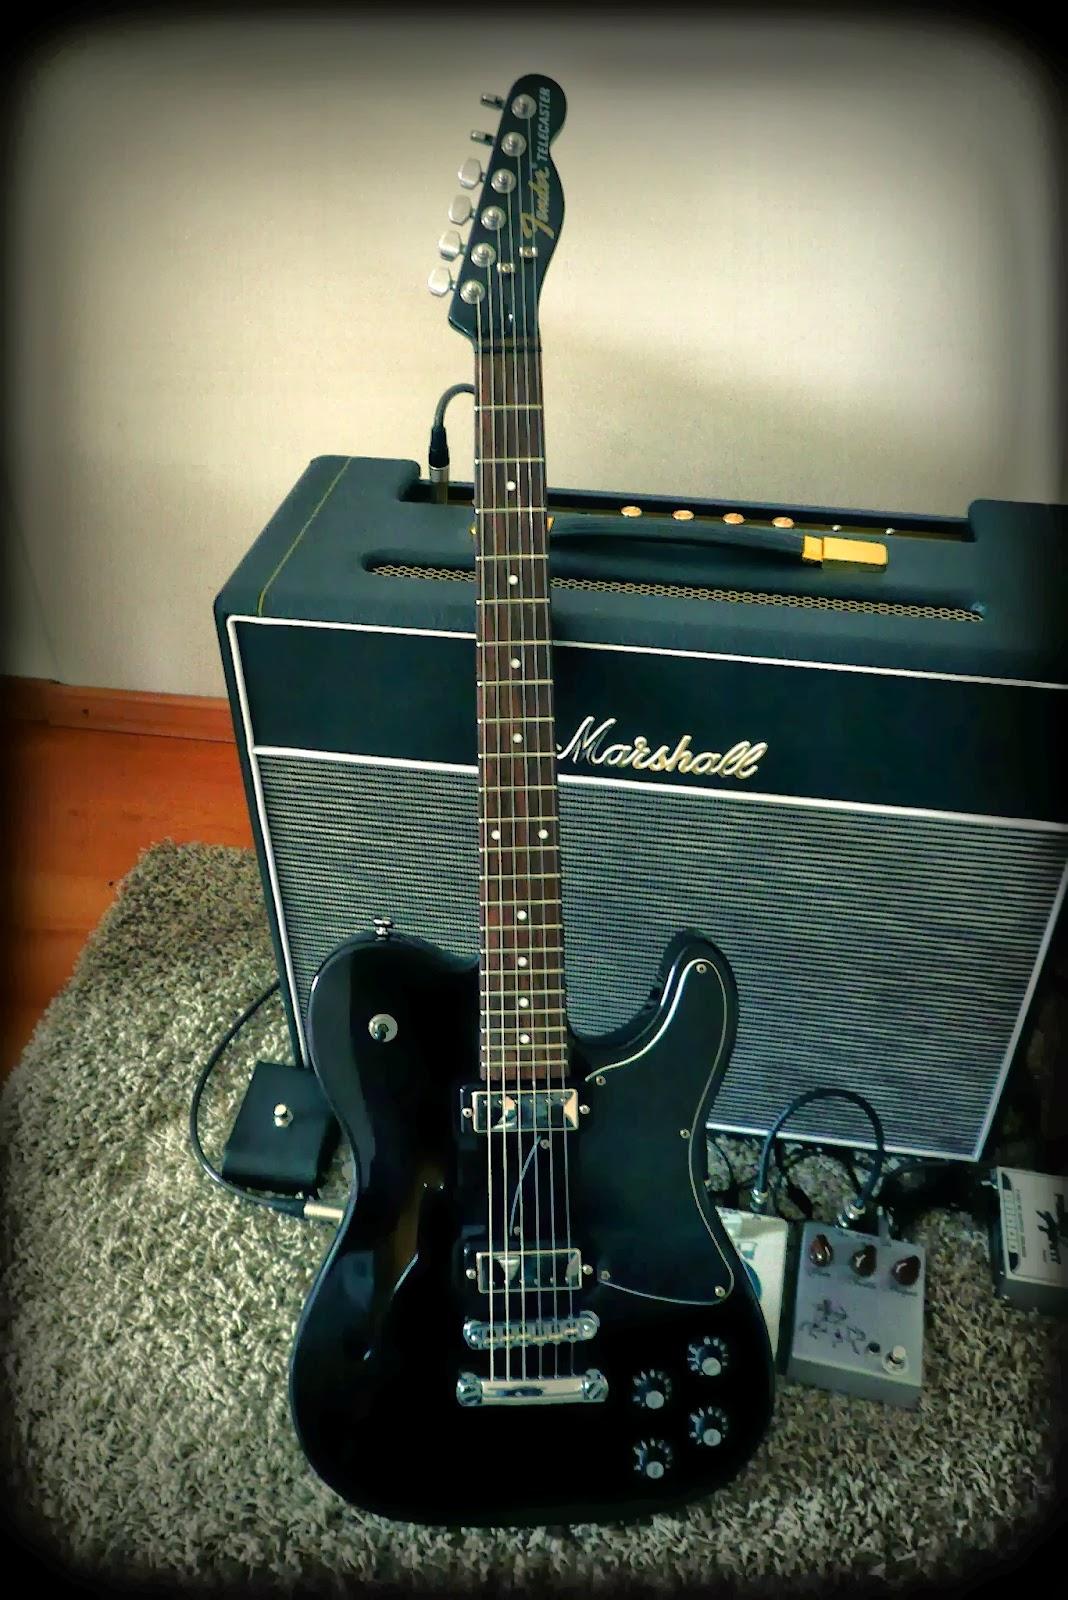 Supreme Vintage Tone: Guitars